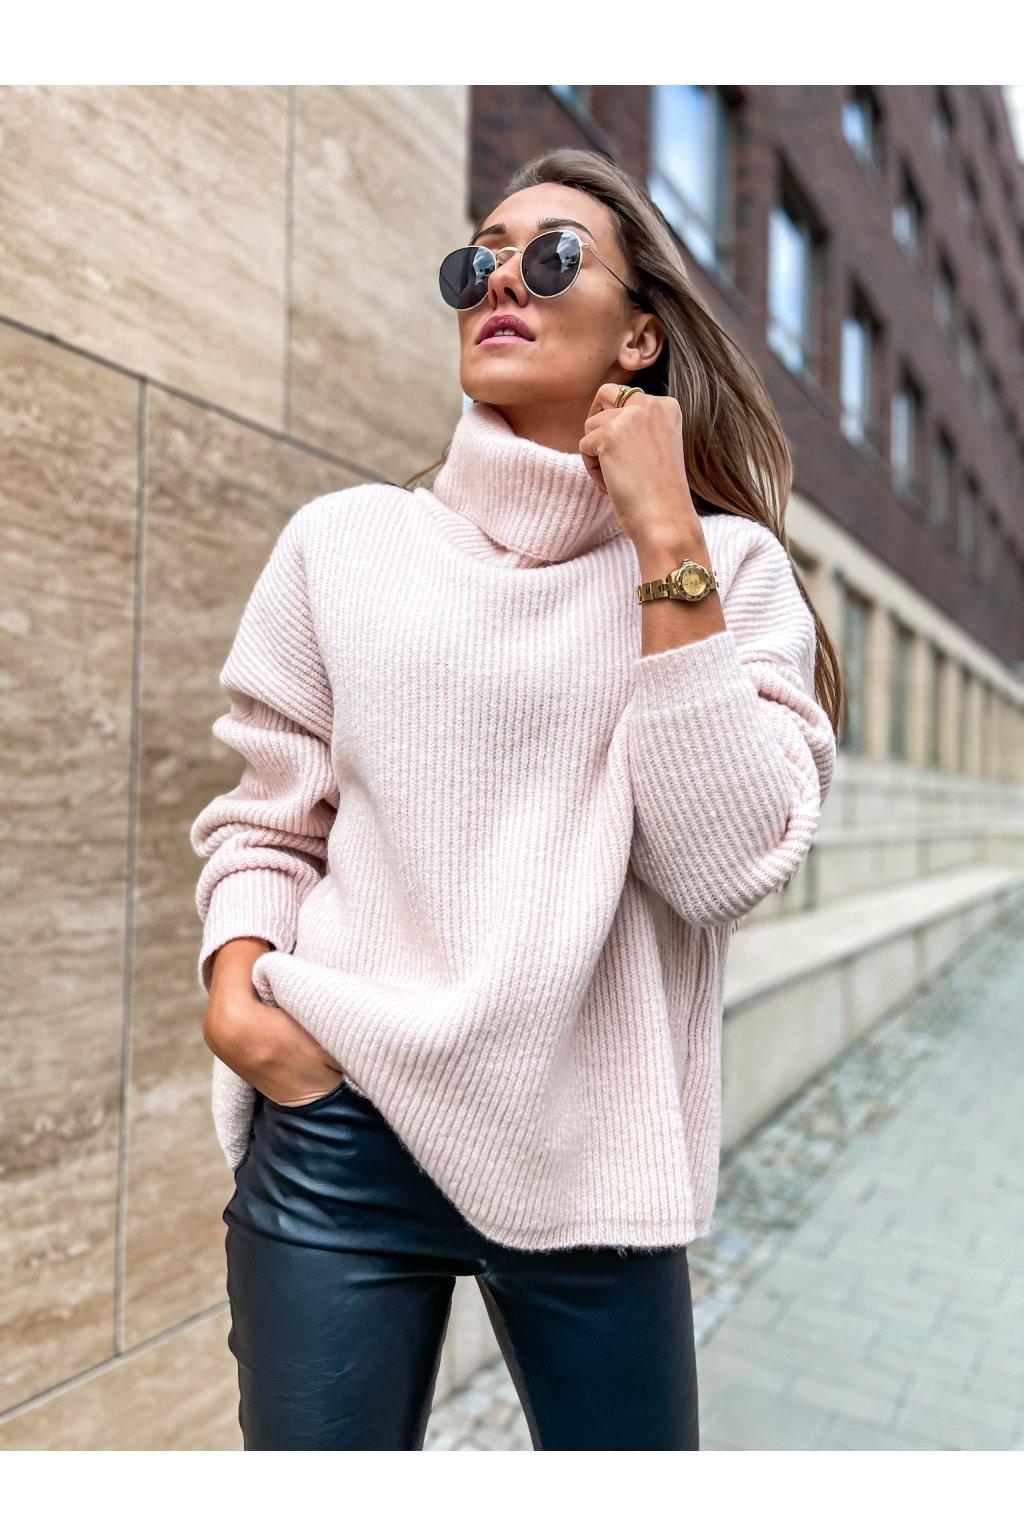 damsky svetr s rolakem light pink eshopat cz 5